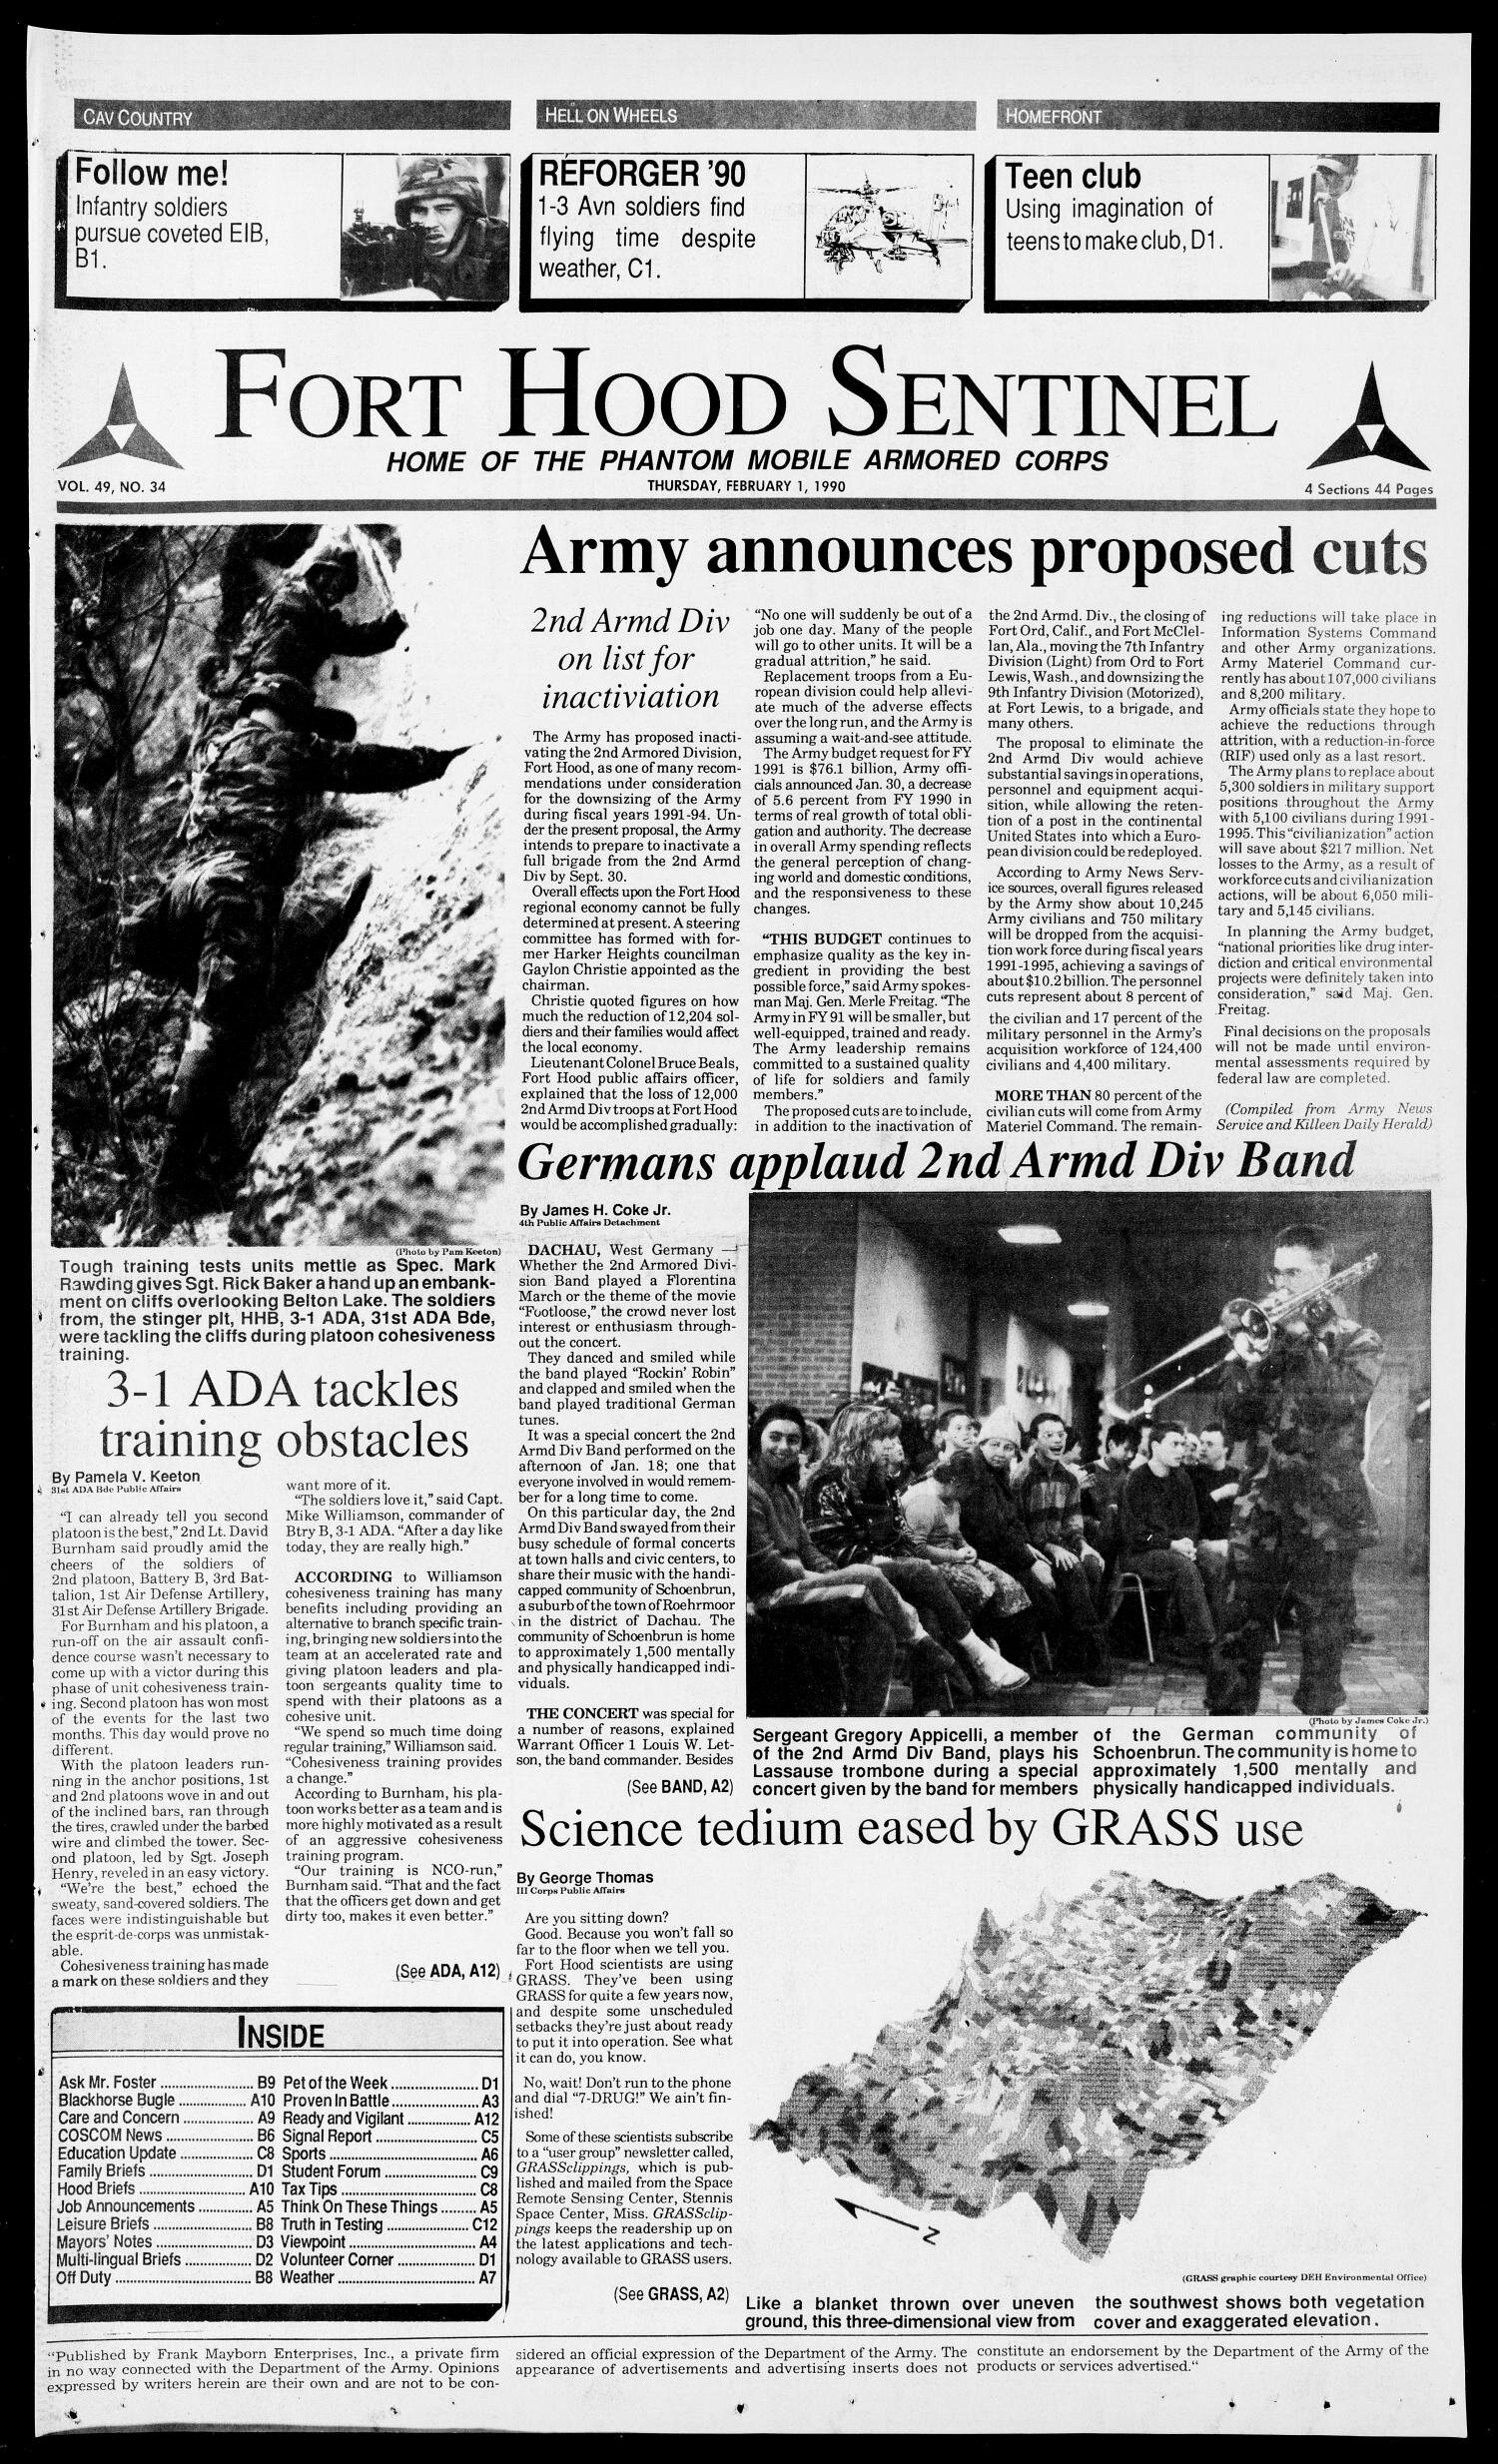 FT. HOOD SENTINEL_1 FEB 1990.jpg